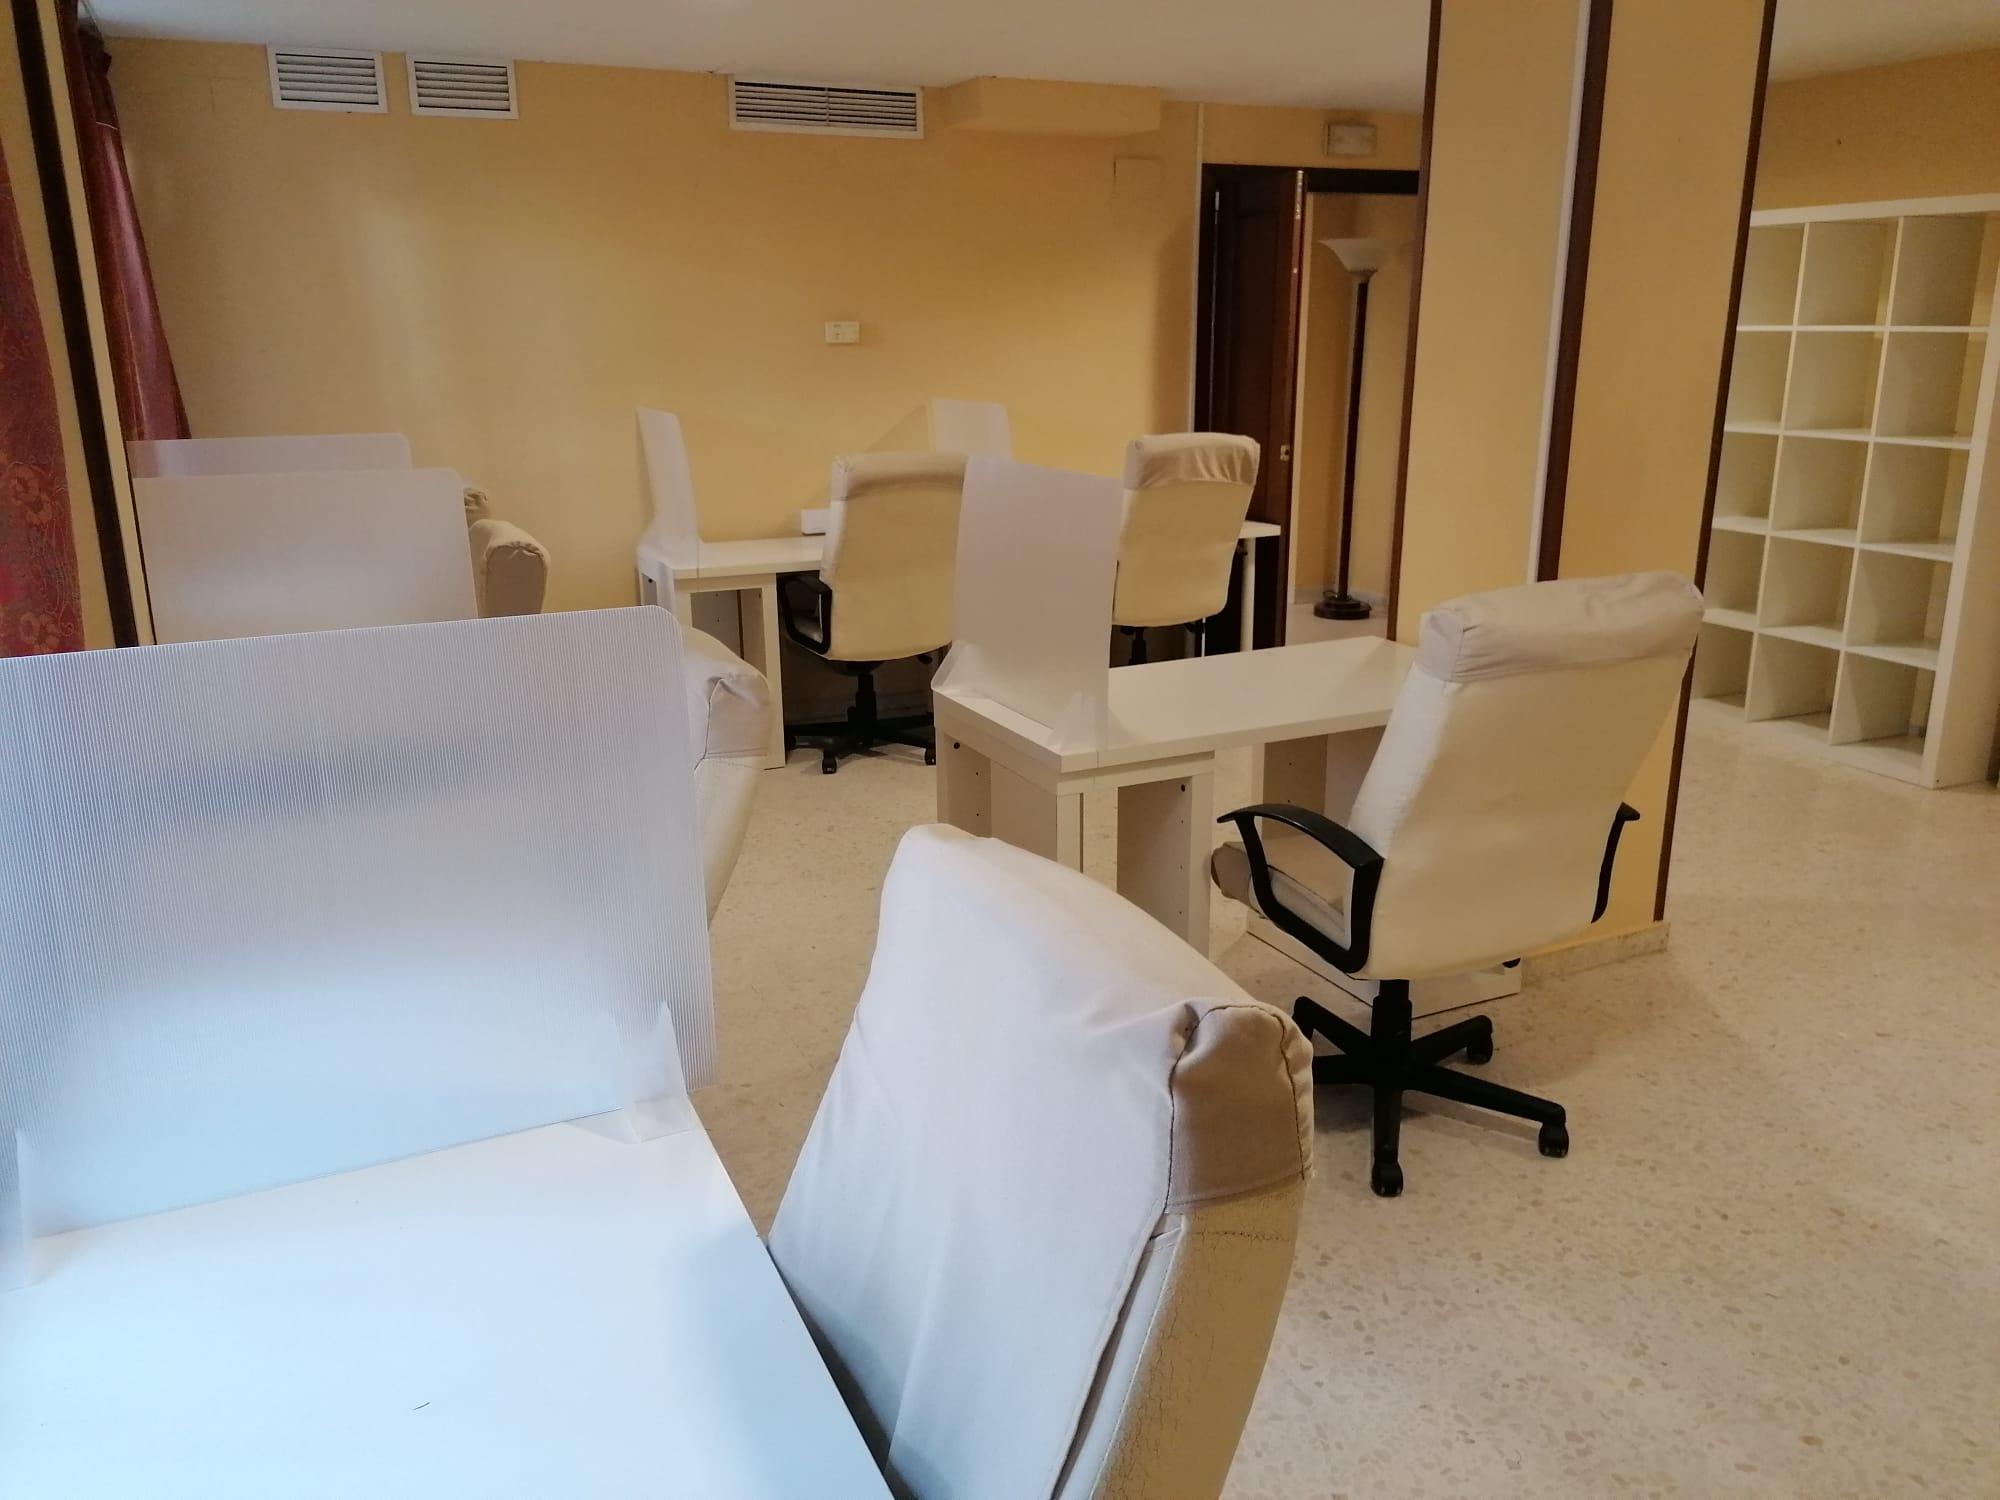 sala de estudios de residencia universitaria